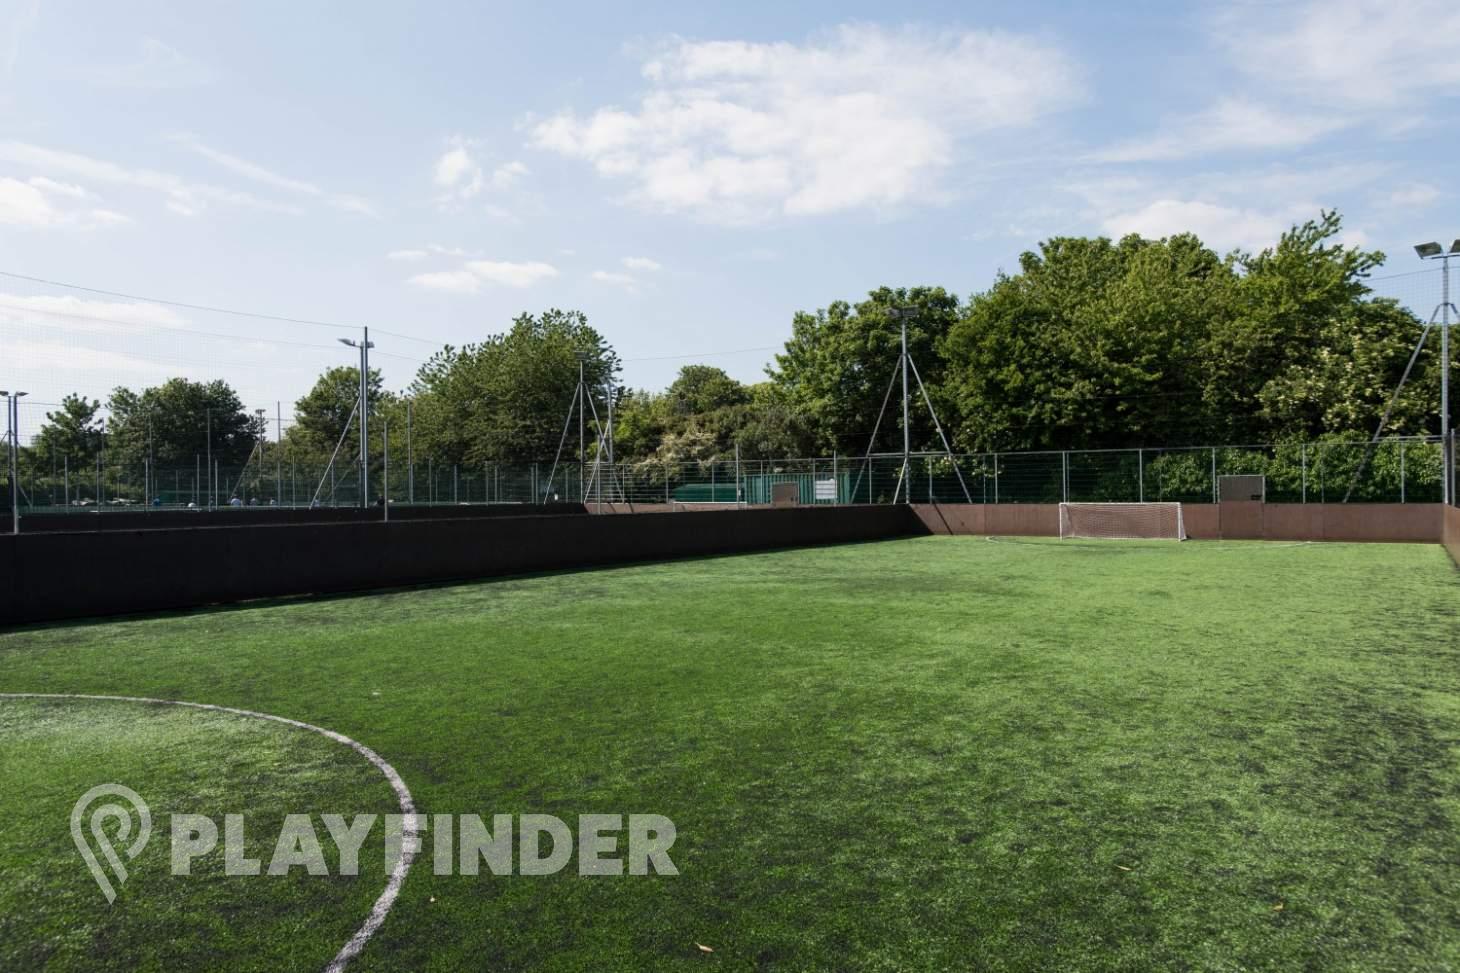 Rocks Lane Barnes 5 a side | 3G Astroturf football pitch